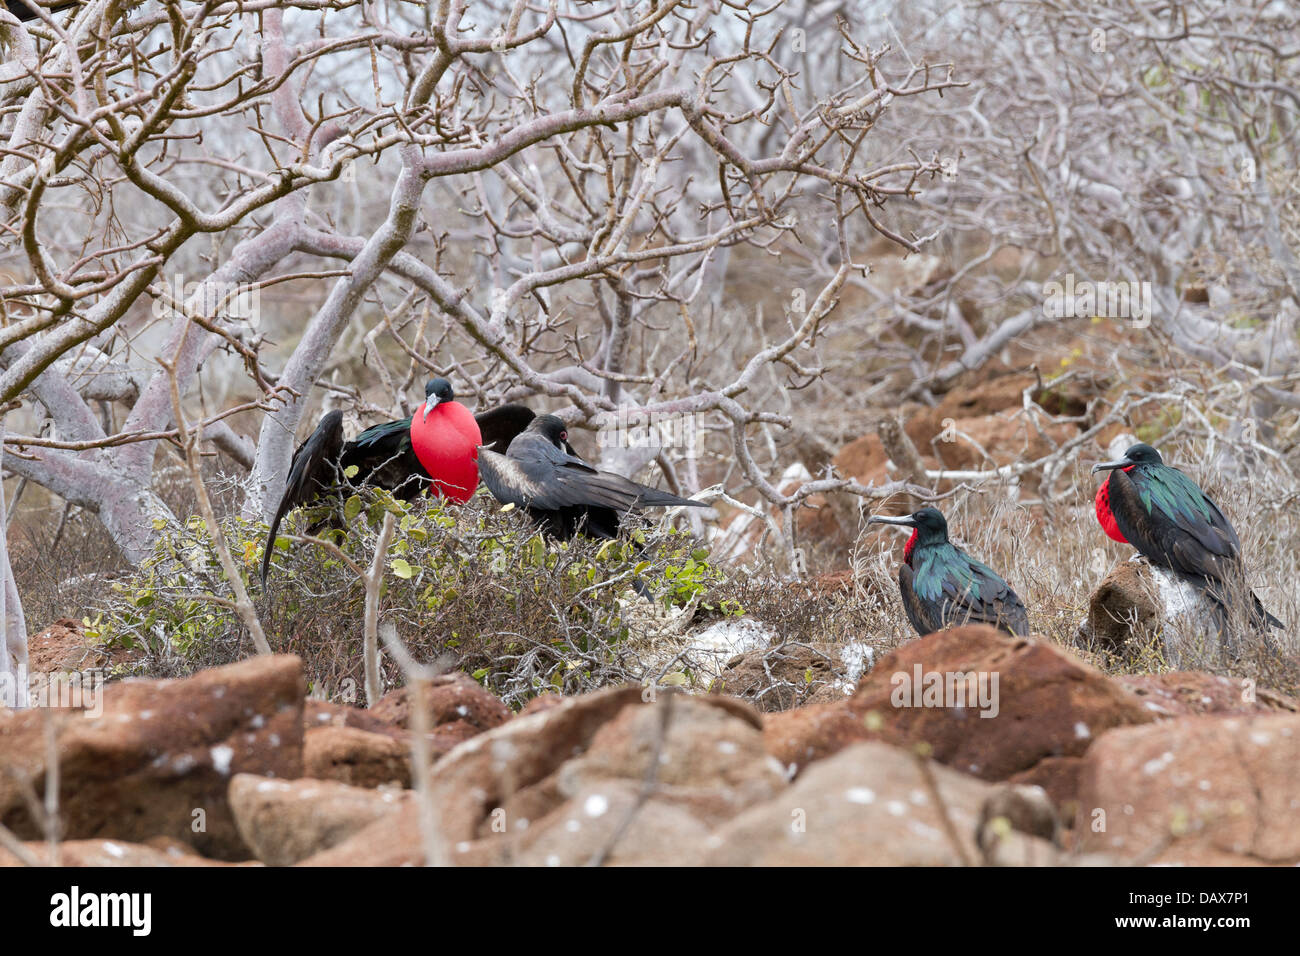 Red Gular Pouch, Frigatebirds, Fregatidae, Fregata, North Seymour, Galapagos Islands, Ecuador - Stock Image